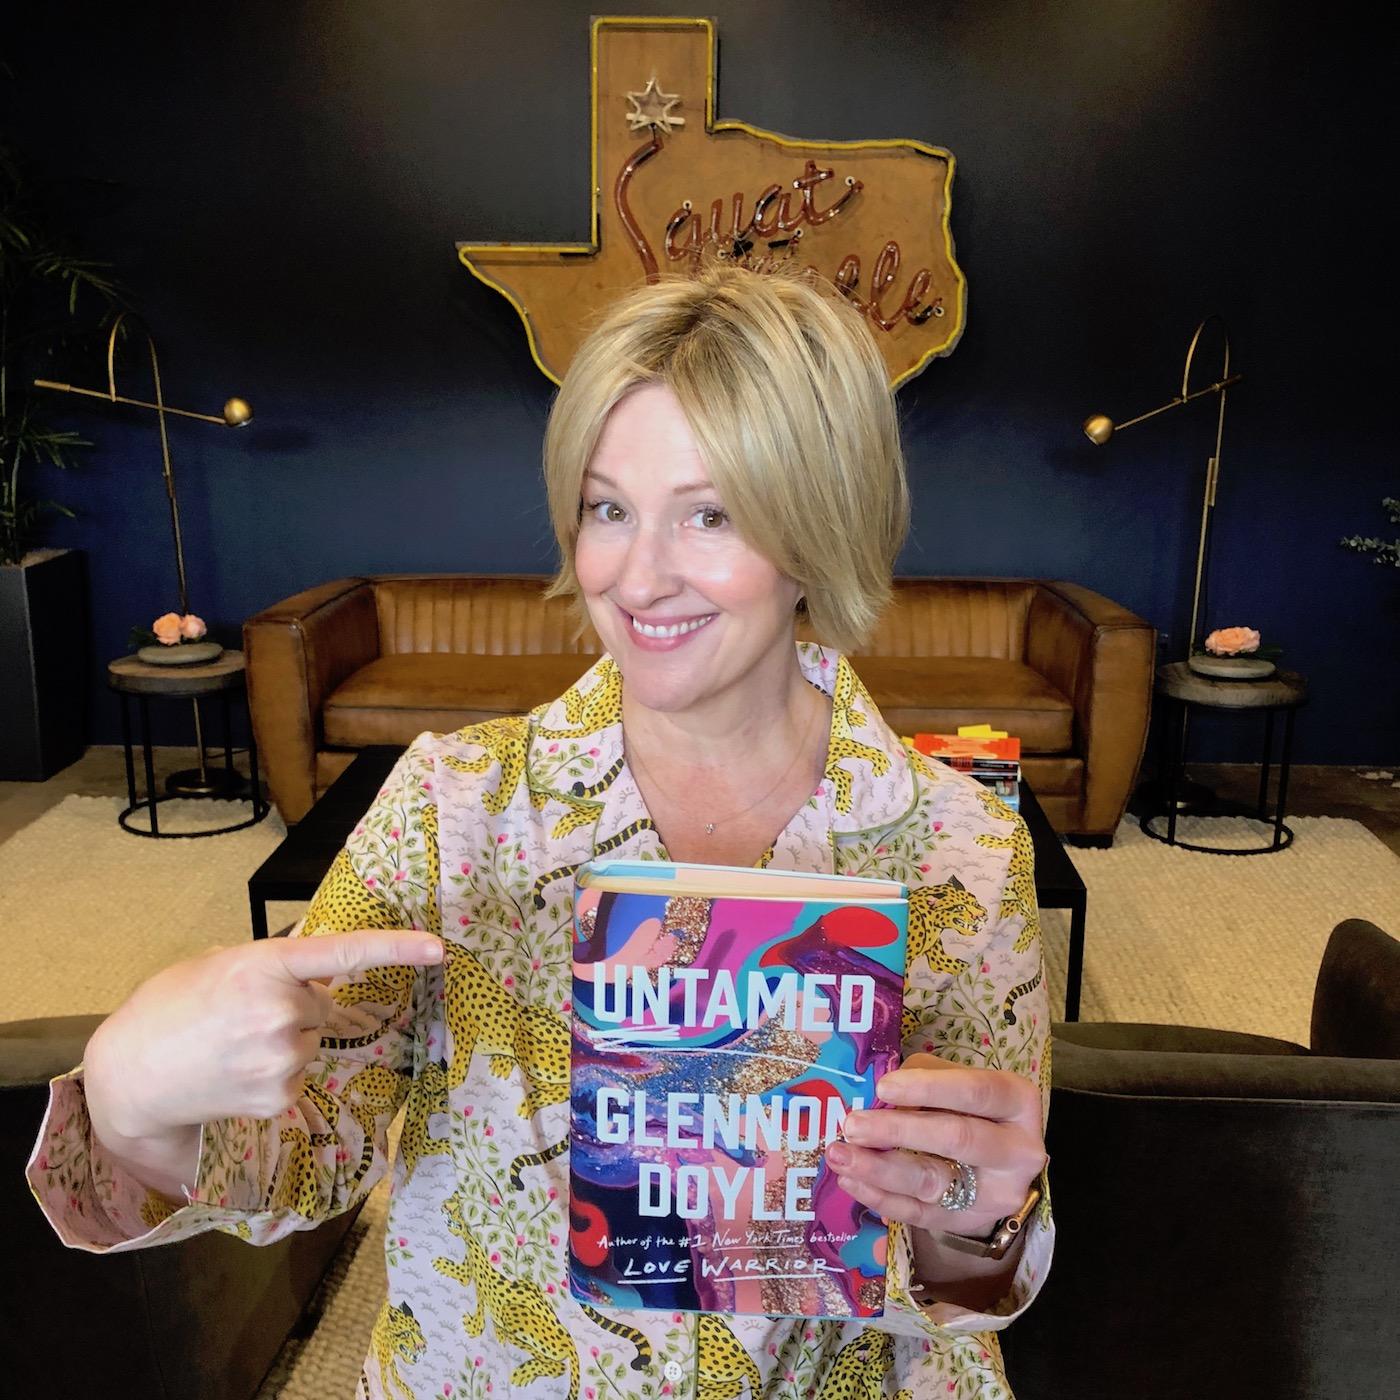 Brené with Glennon's book